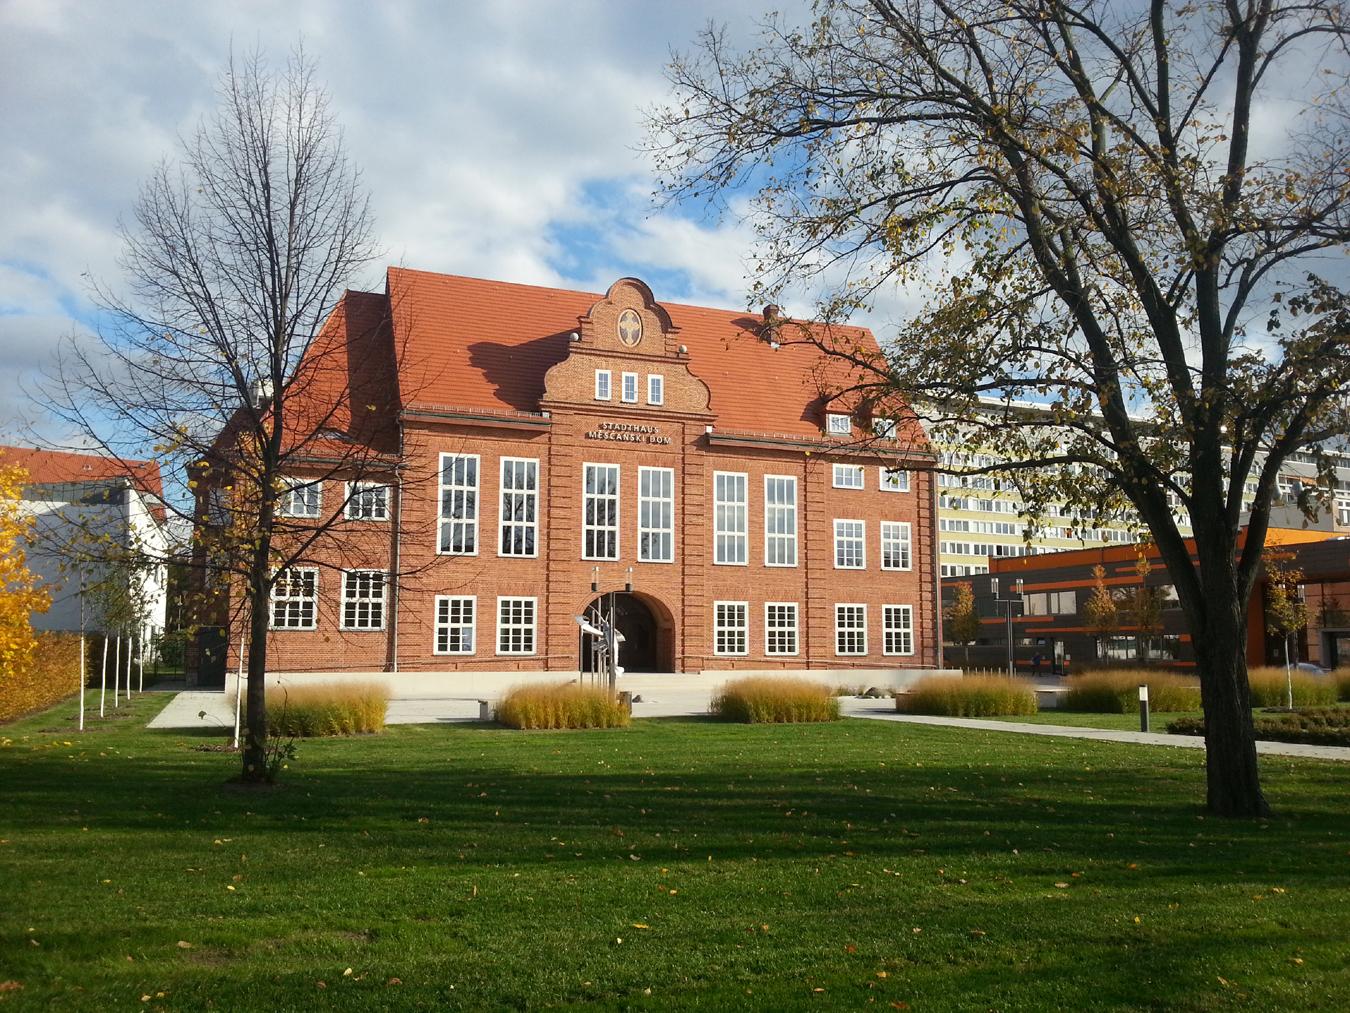 Stadthaus Cottbus5 a8